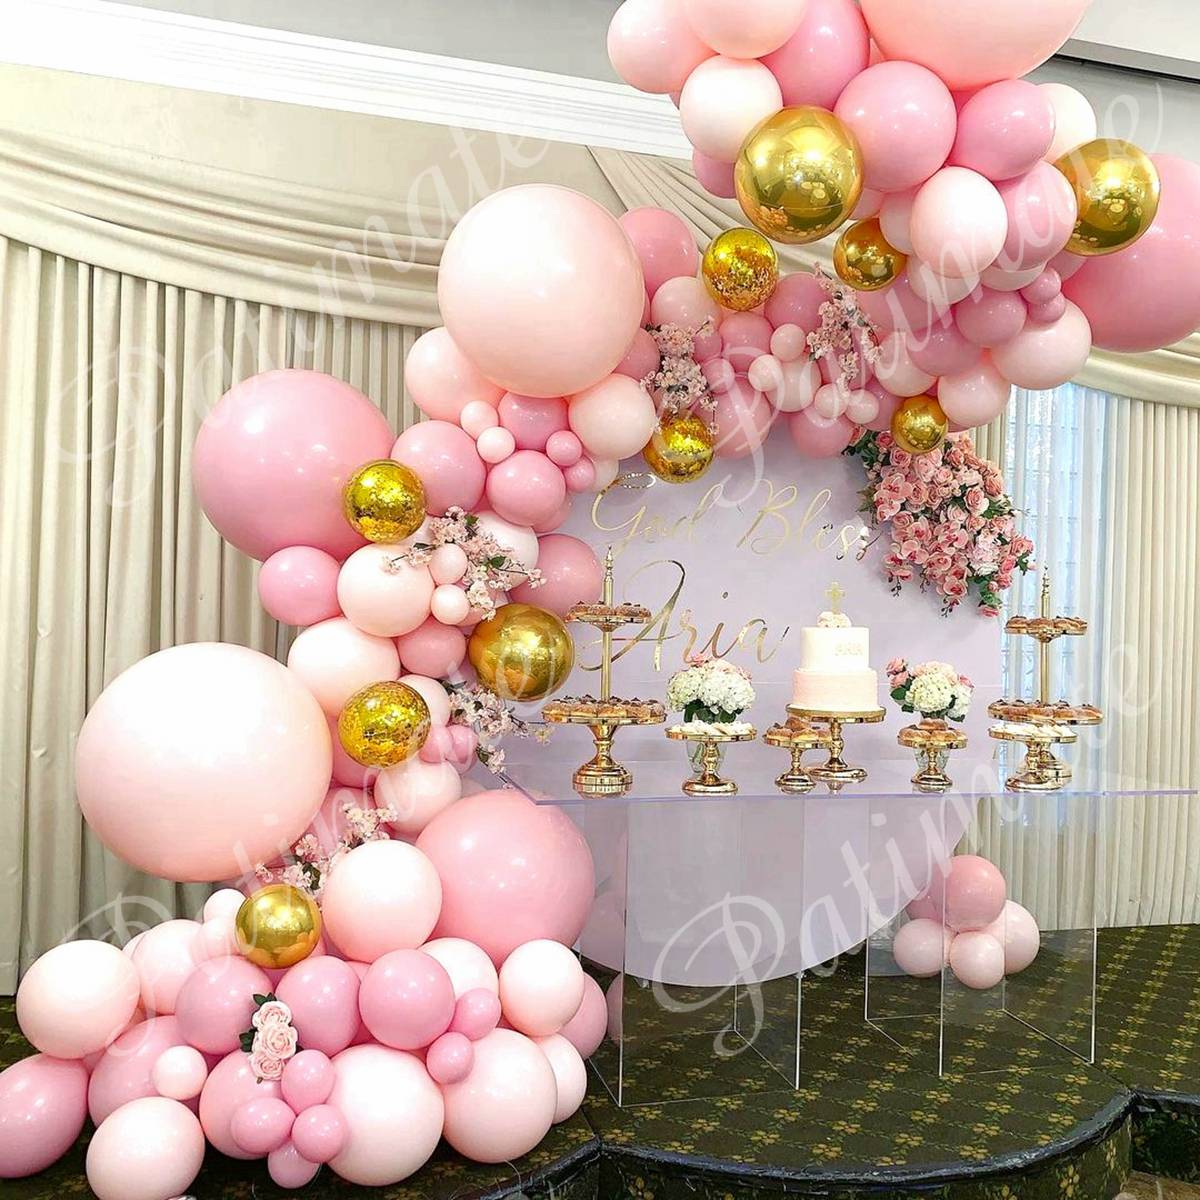 Macaron Pink Balloon Garland Arch Kit Wedding Birthday Party Decoration Kids Globos Rose Gold Confetti Latex Ballon Baby Shower 4